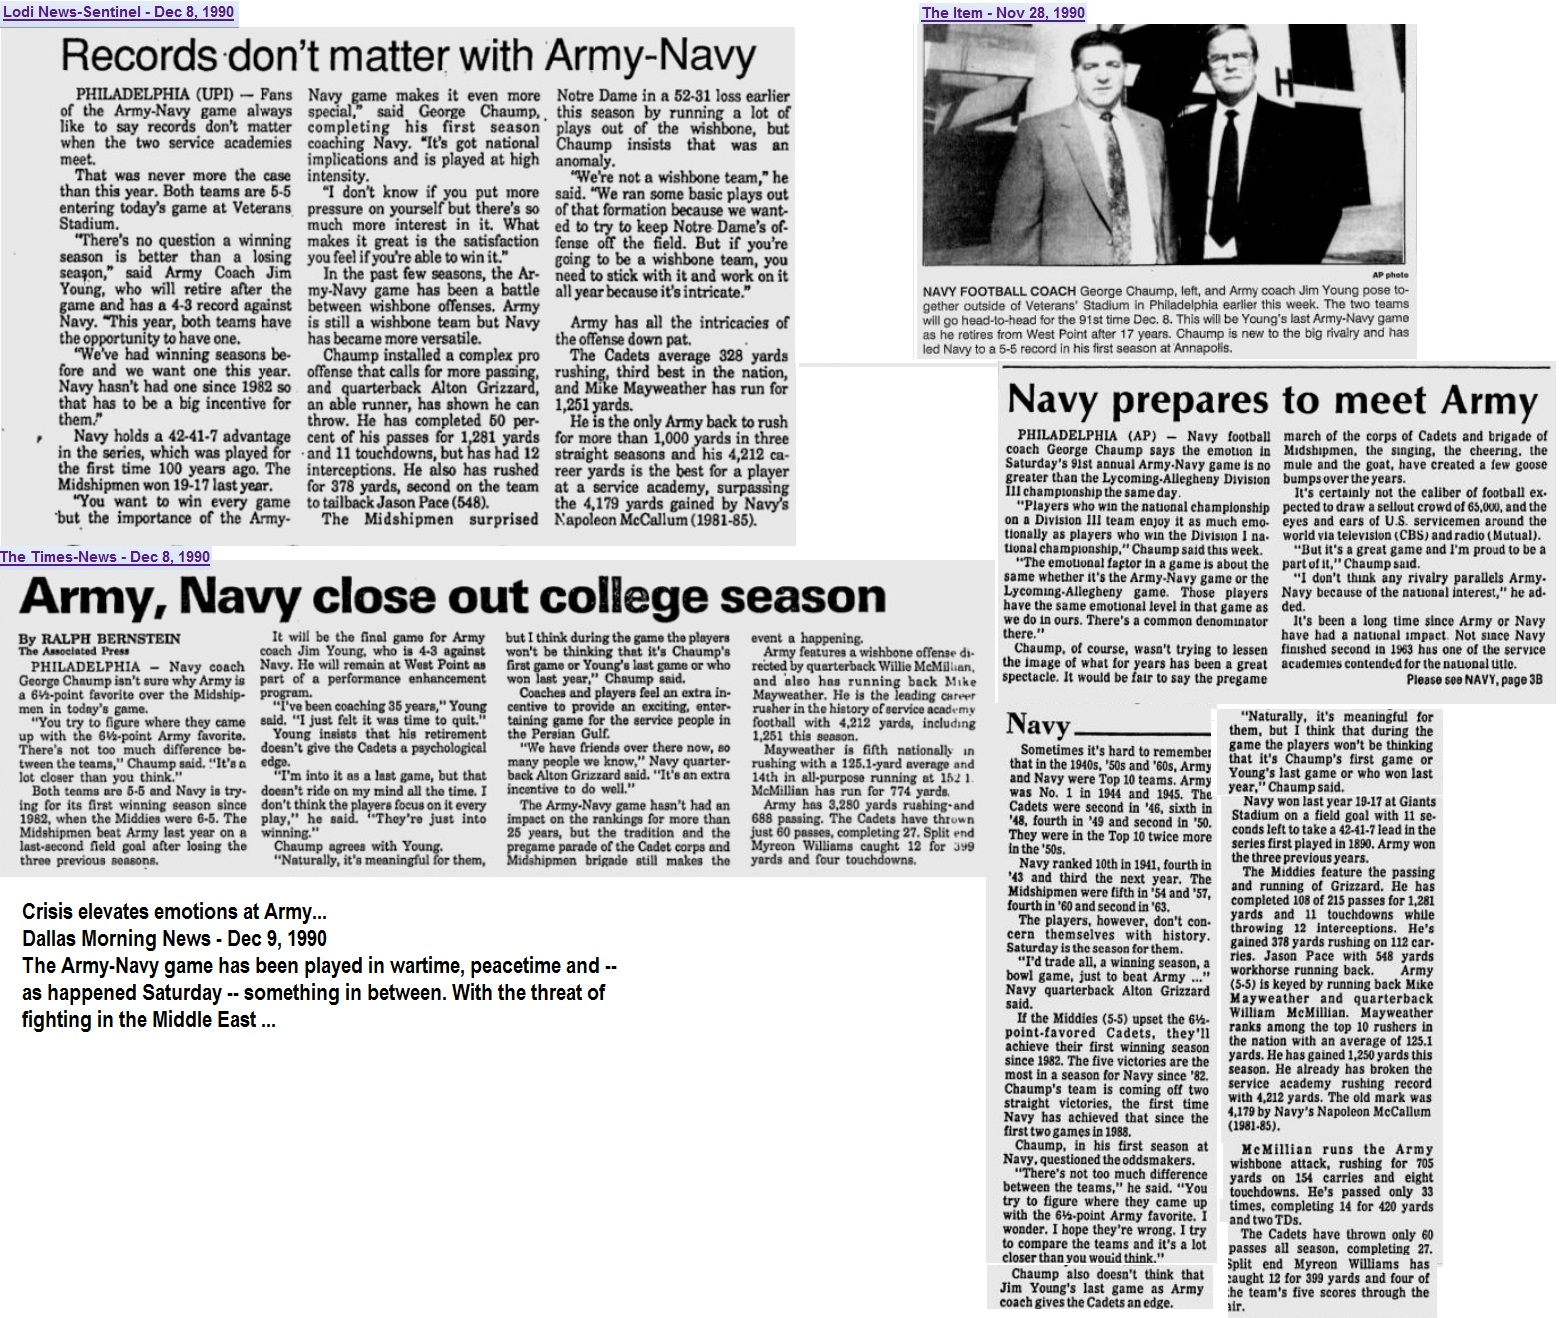 armyfb_1990_vsnavy-pre_various_dec1990